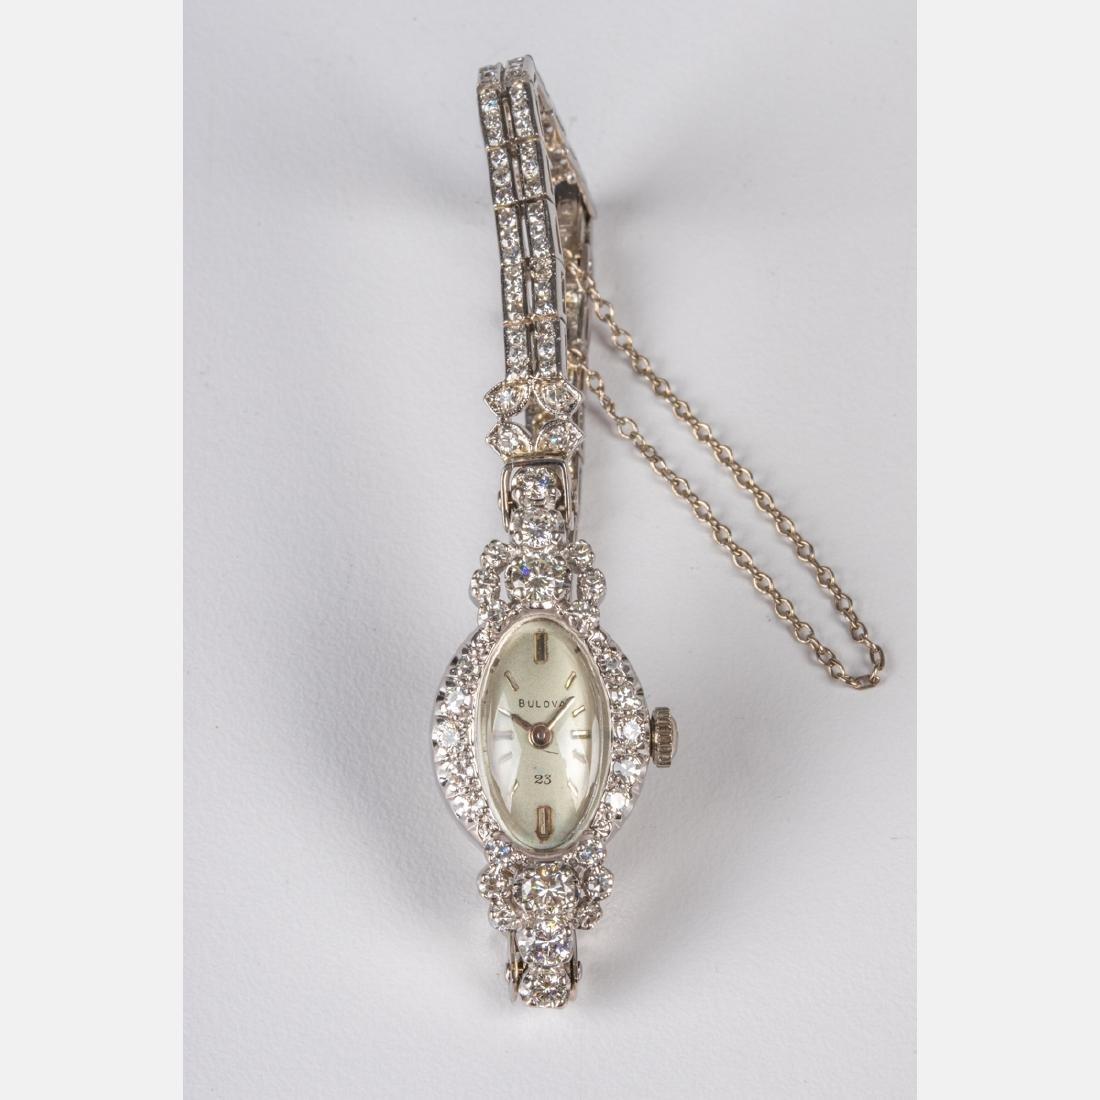 A 14kt. White Gold, Platinum and Diamond Ladies Bulova